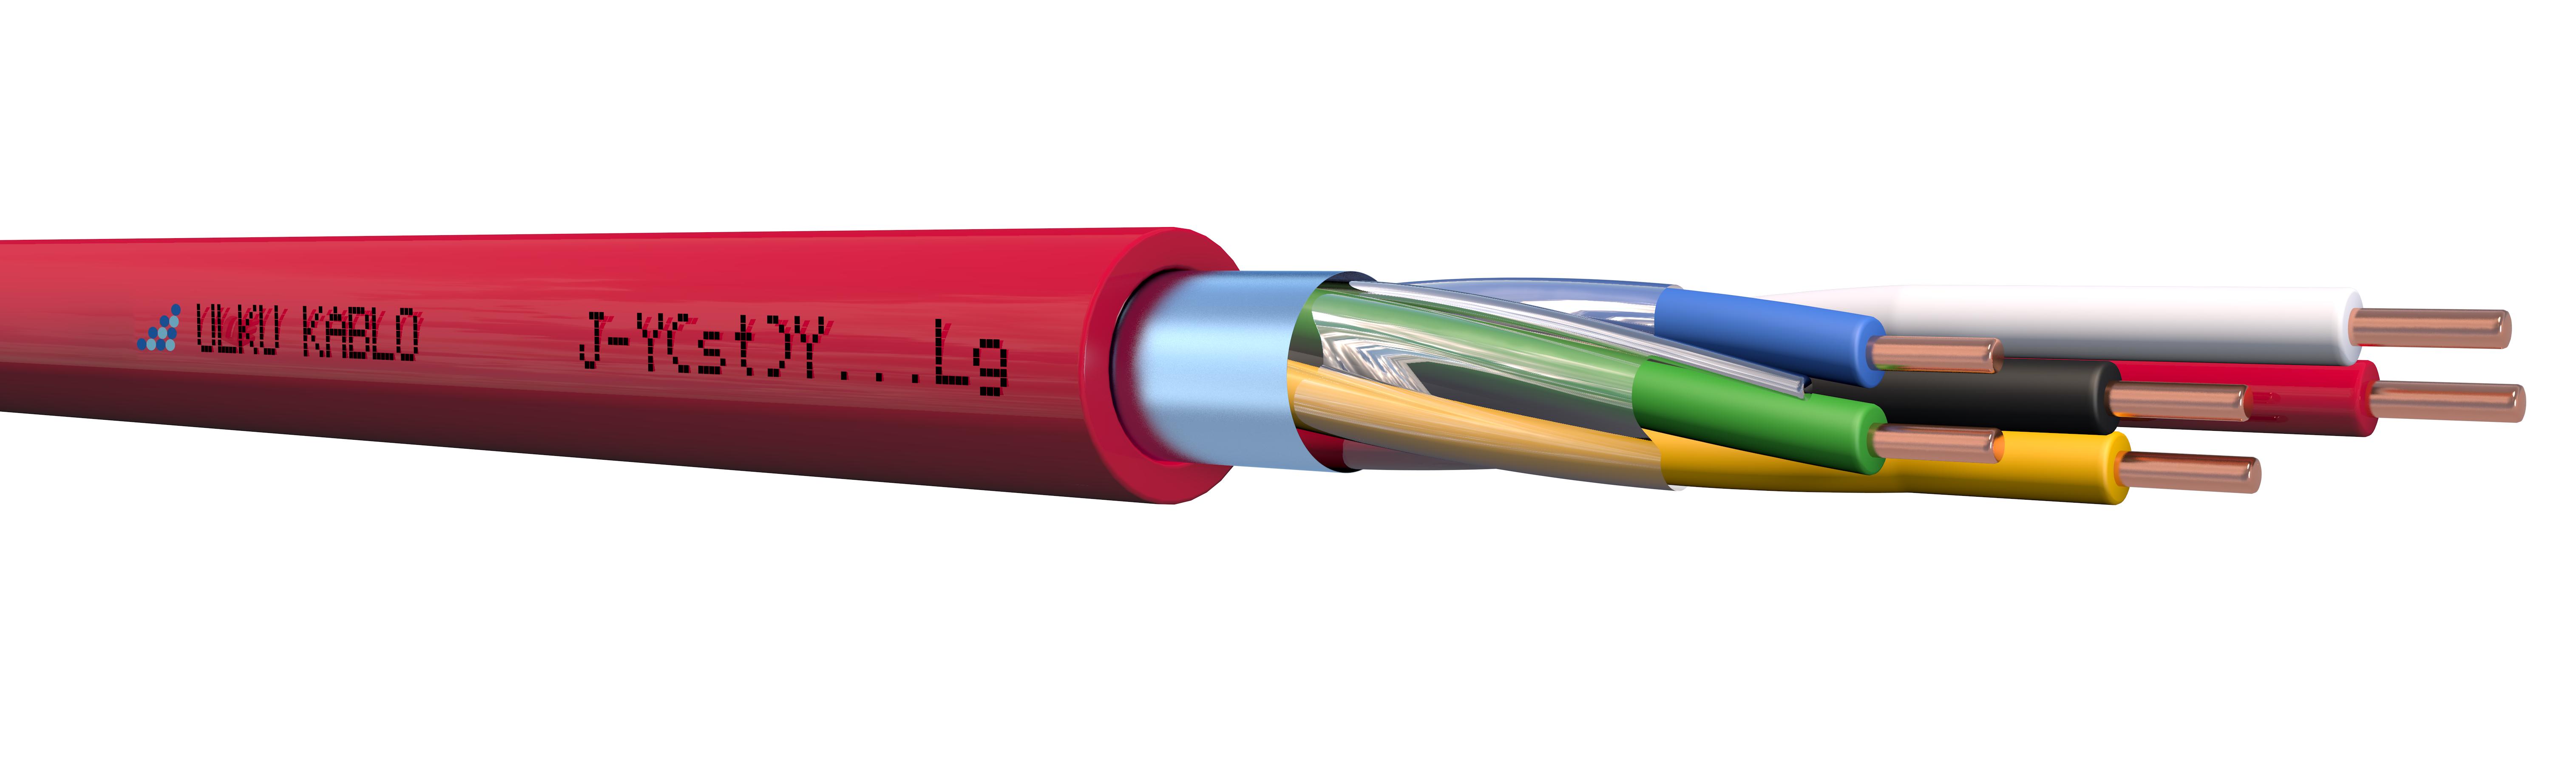 Ülkü Kablo J-Y(St)Y...Lg 3x2x1mm+0,60mm